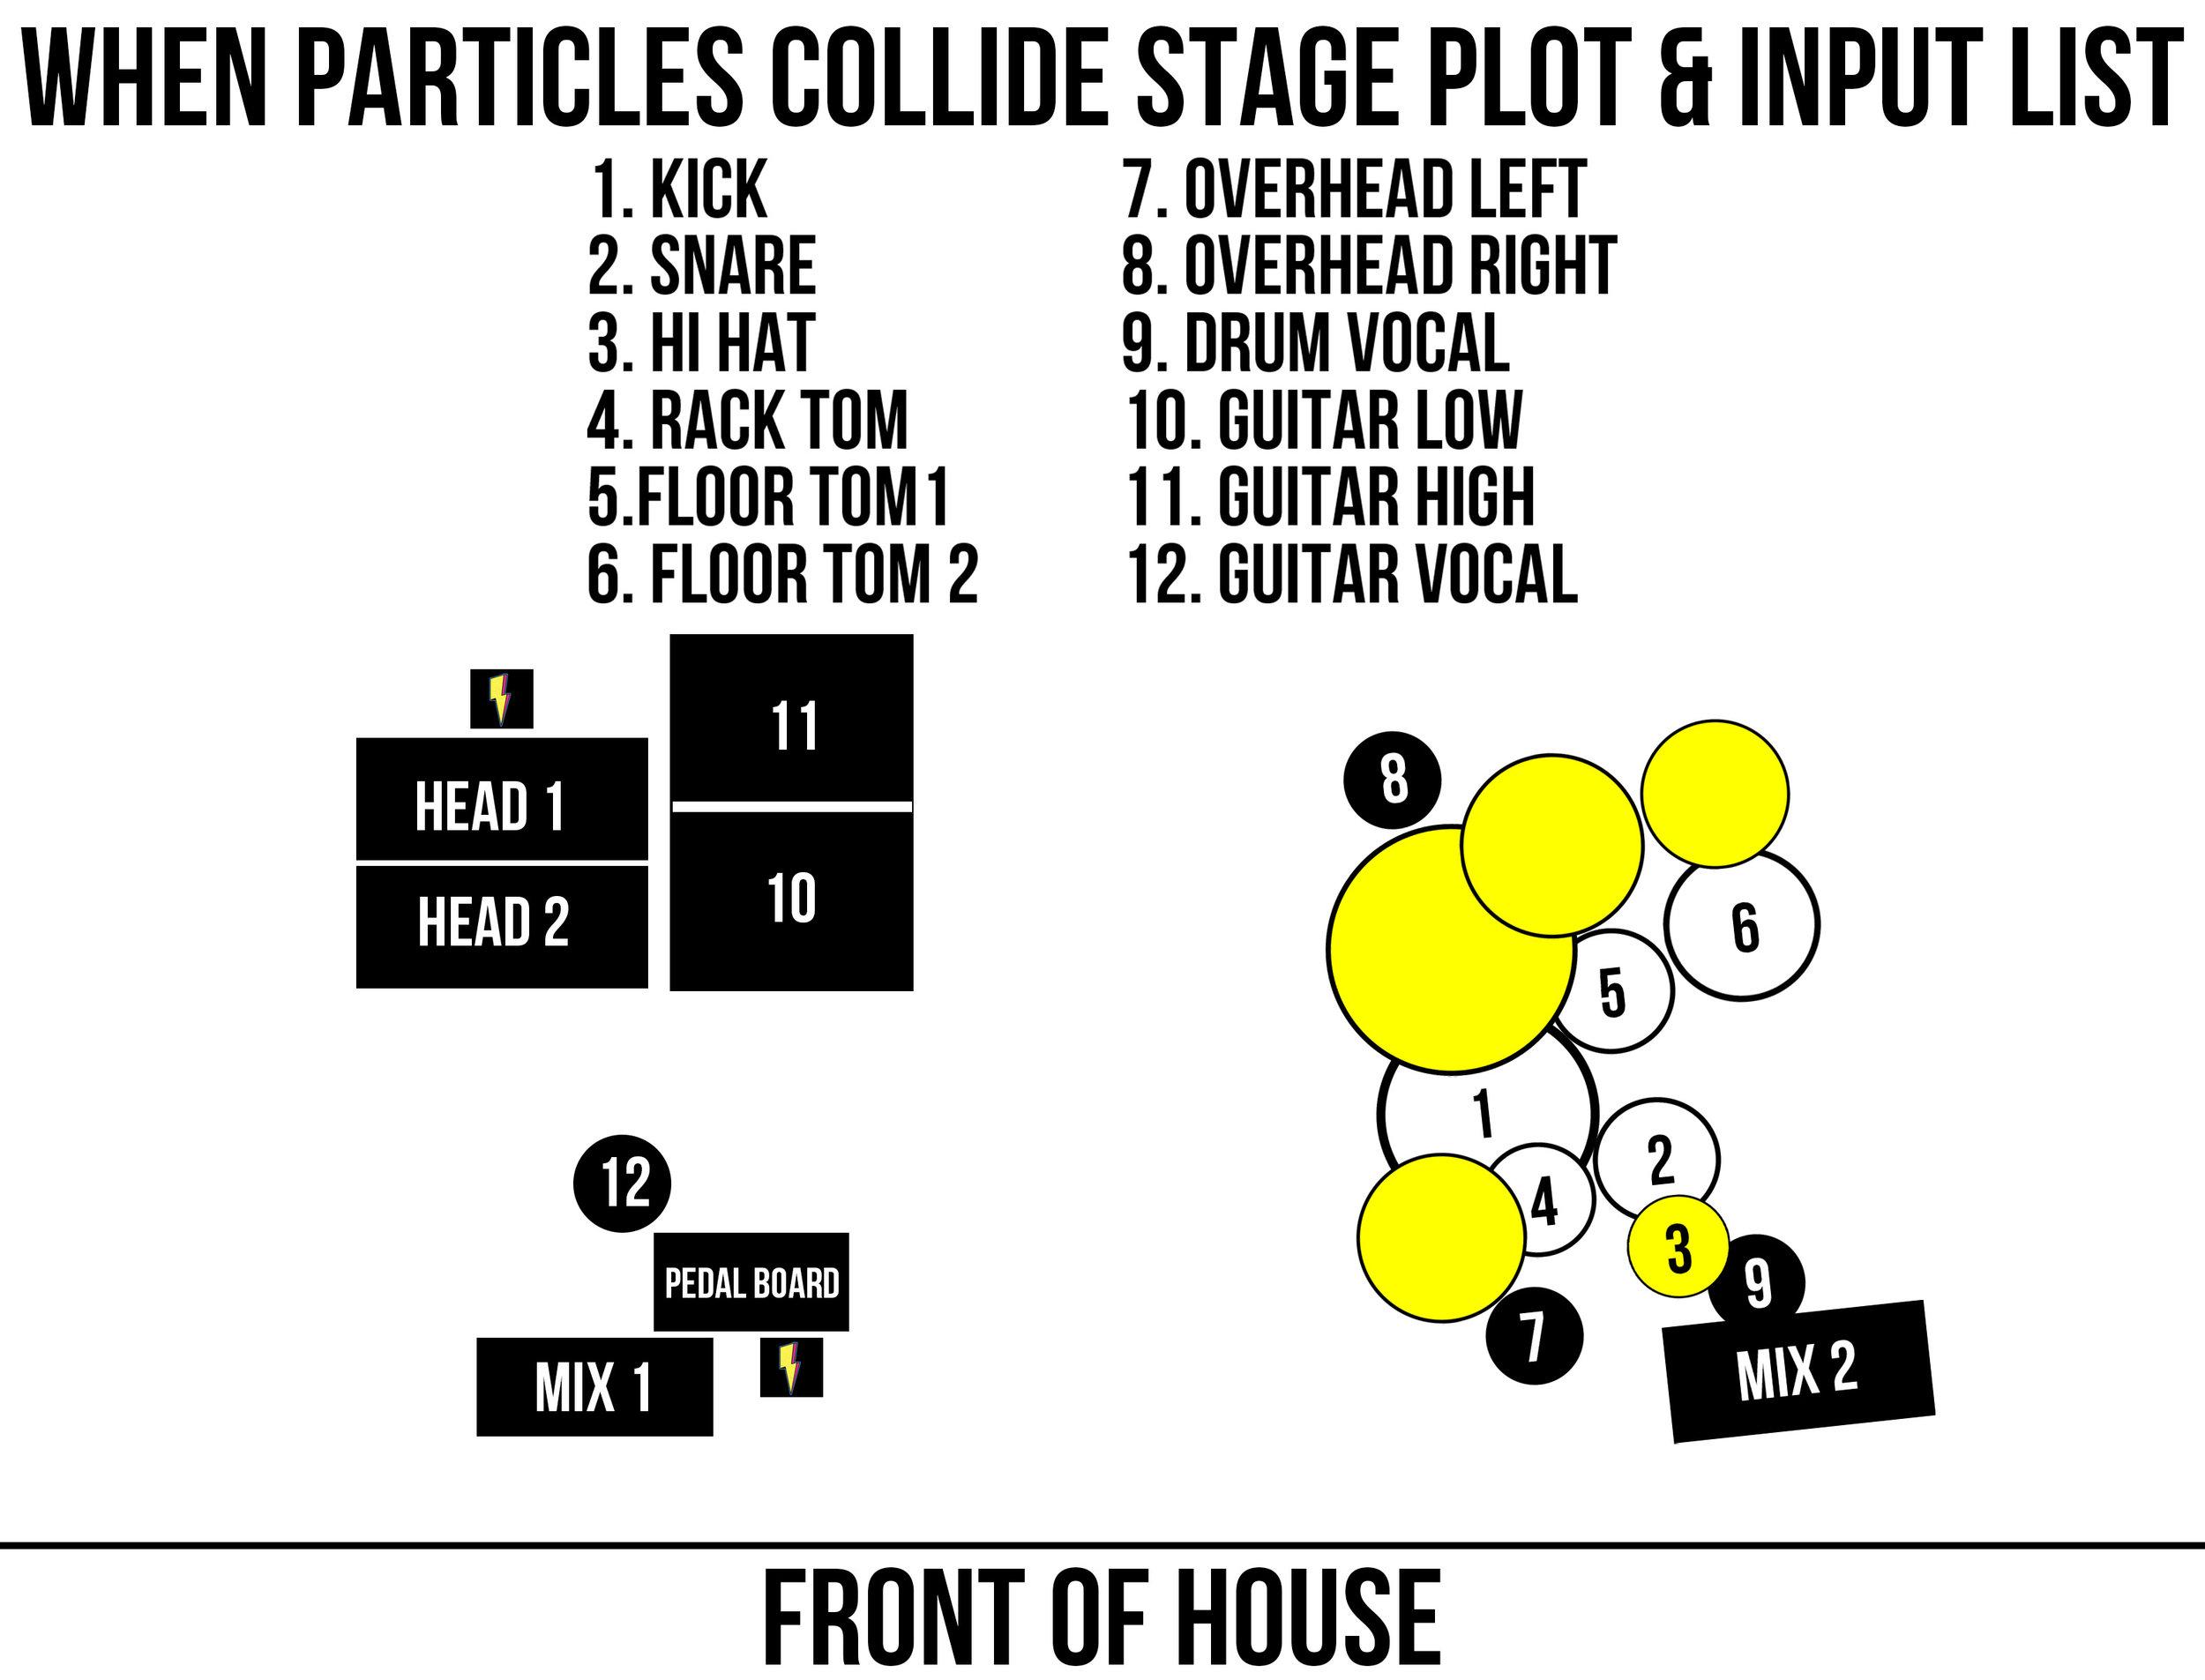 StagePlot2019.jpg